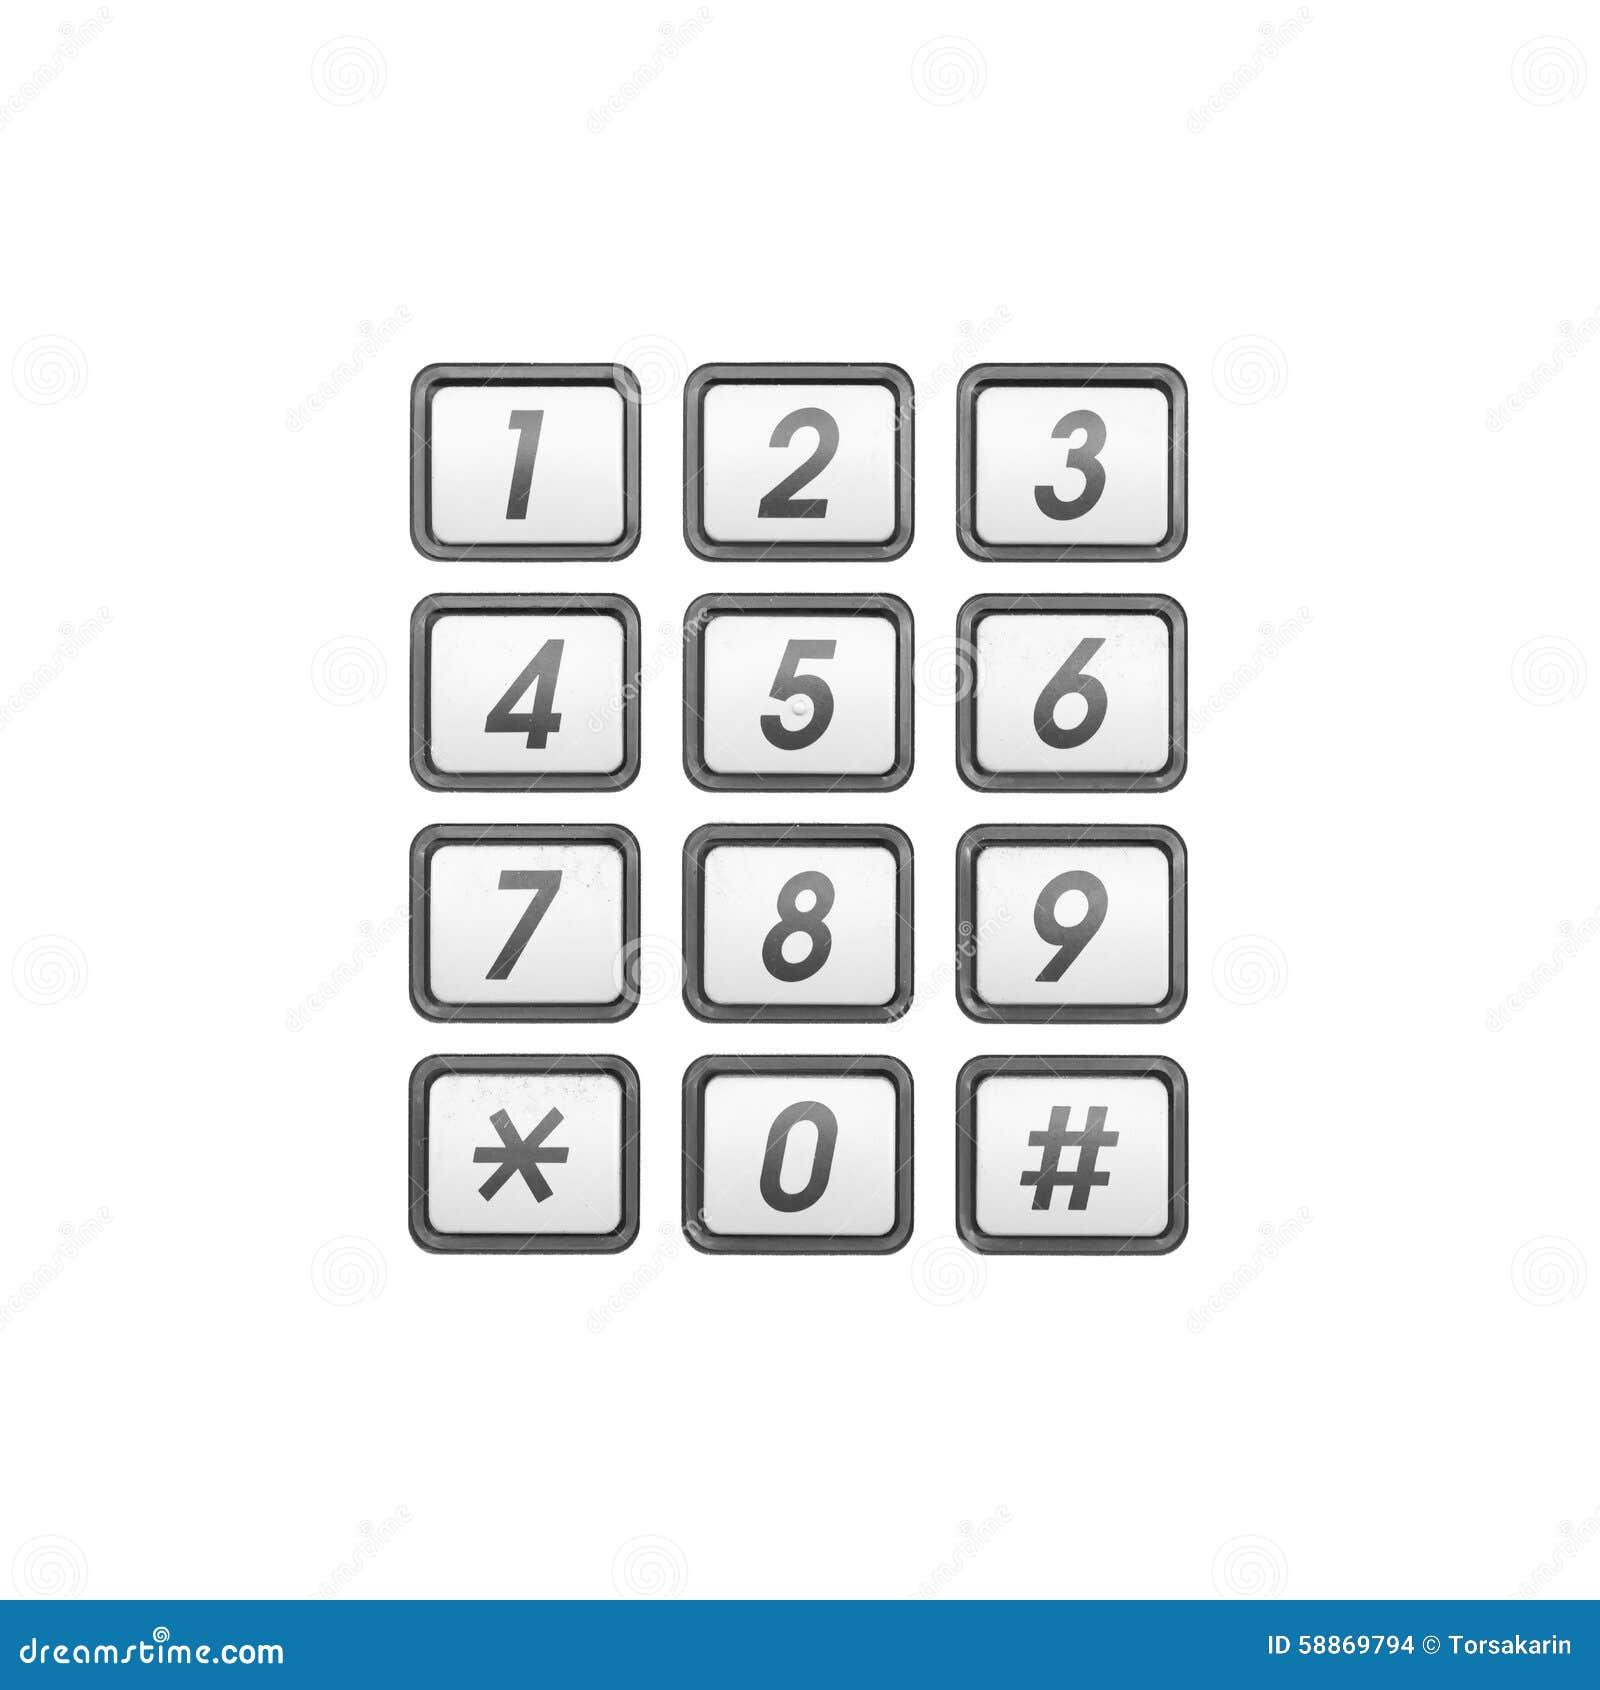 Phone number keypad stock photo. Image of metal, keyboard - 58869794